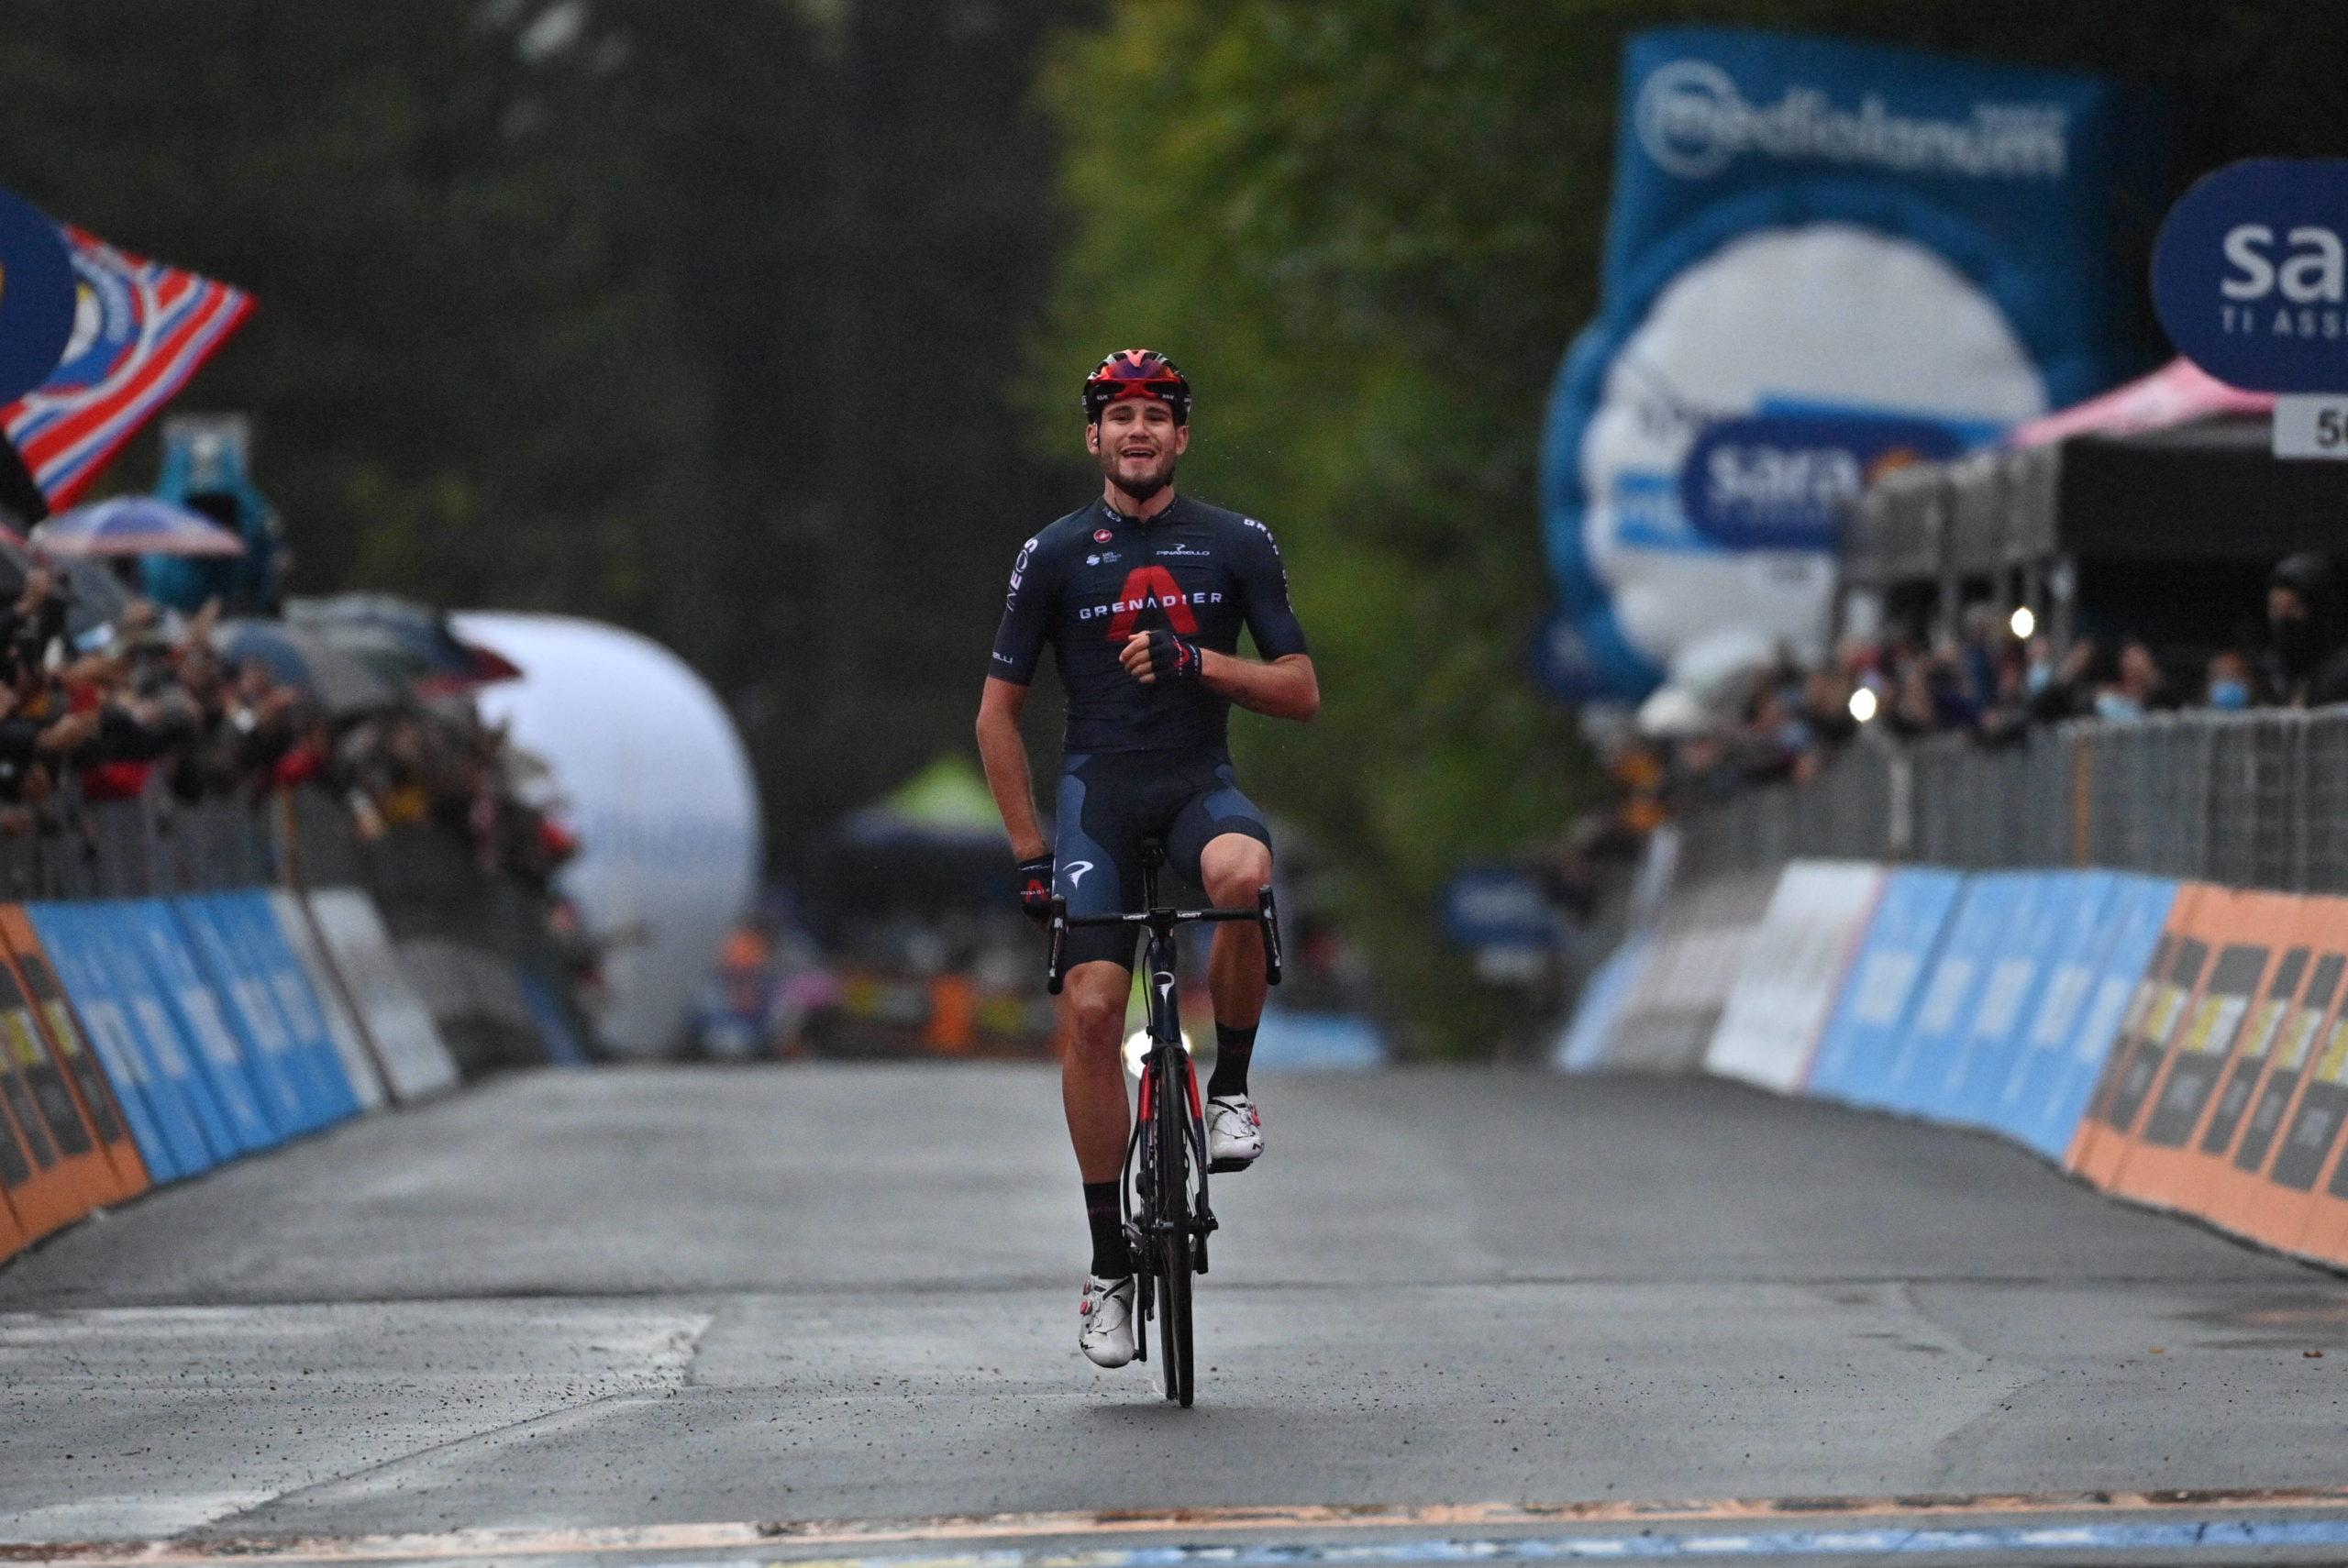 Sejr til temporytter på bjergrig etape i Giro'en